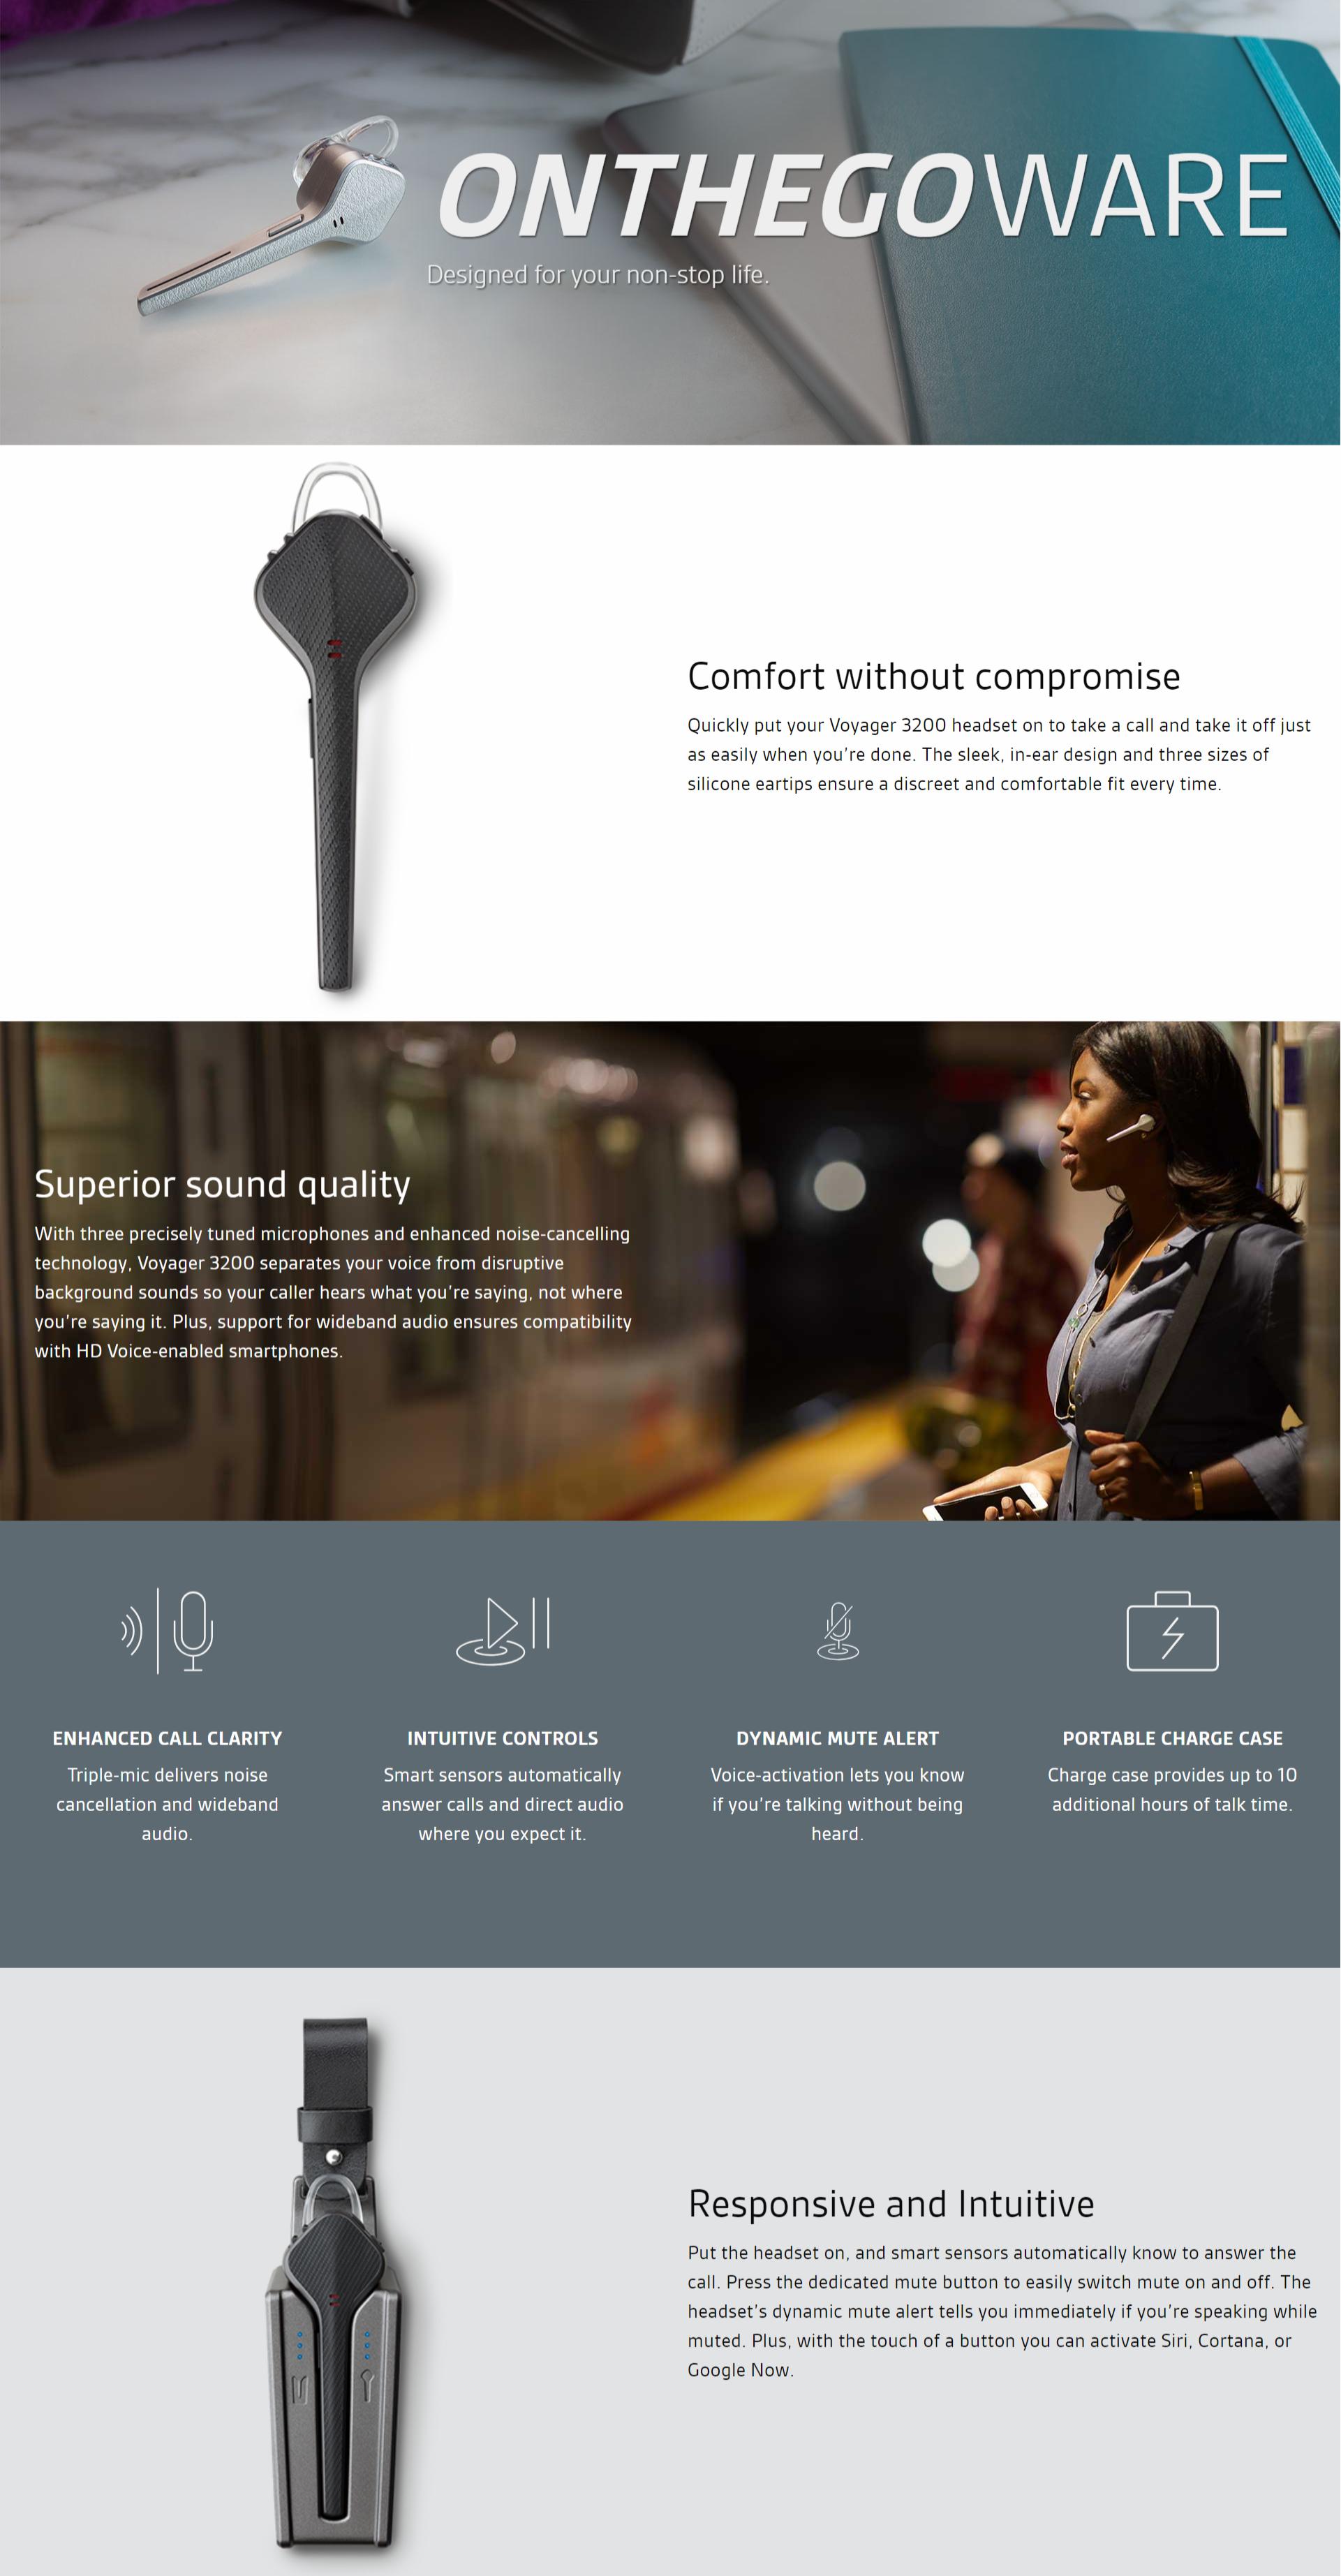 Plantronics Voyager 3200 Discreet Bluetooth Headset System